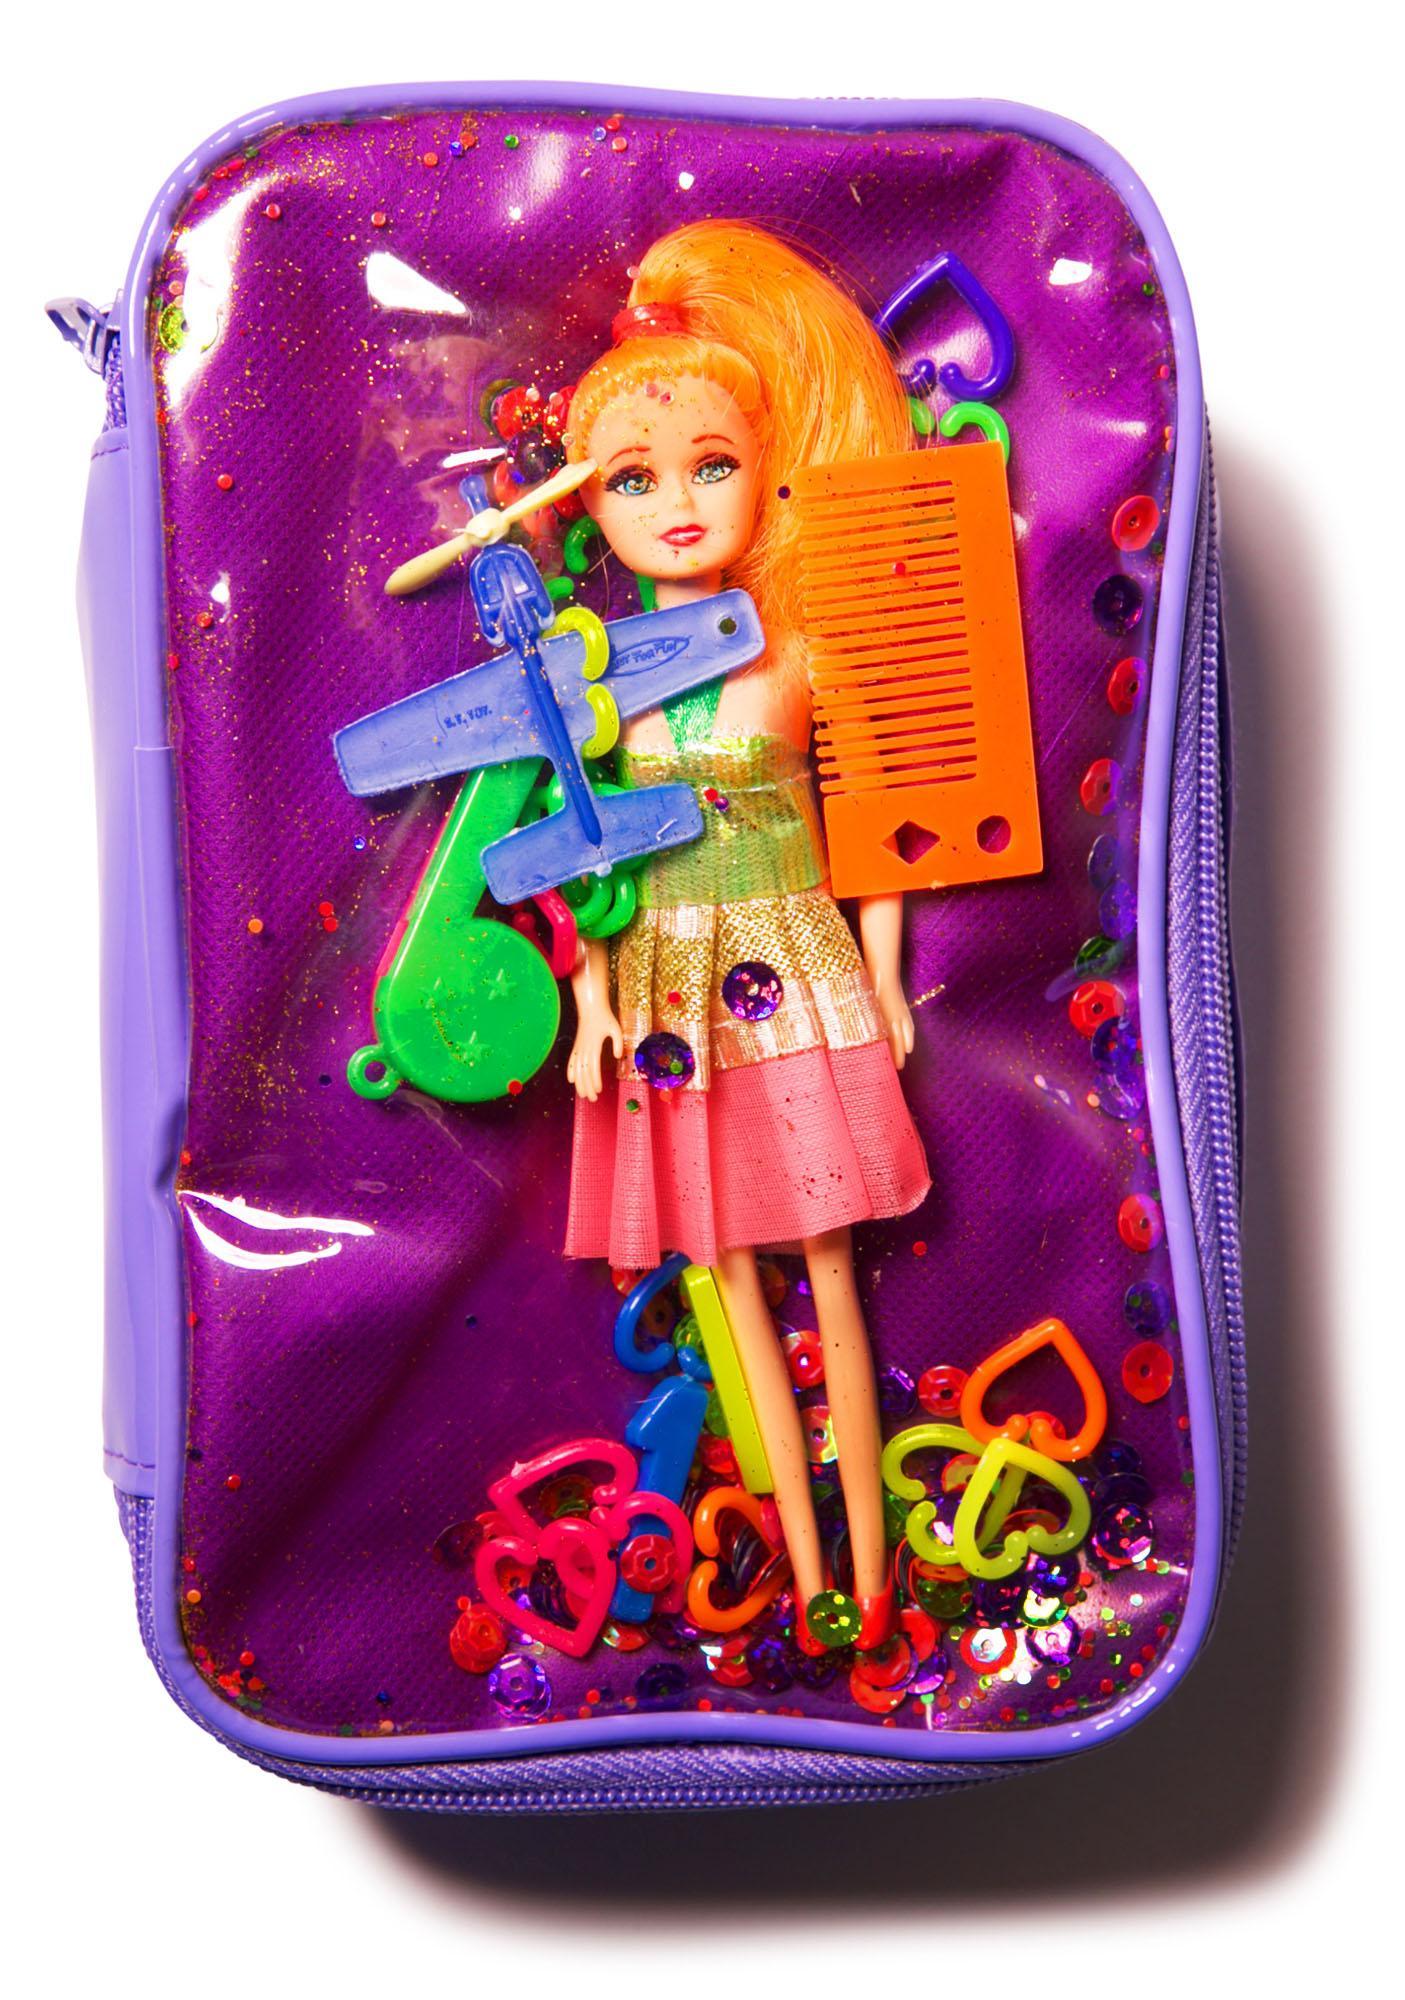 Life in Plastic Bag